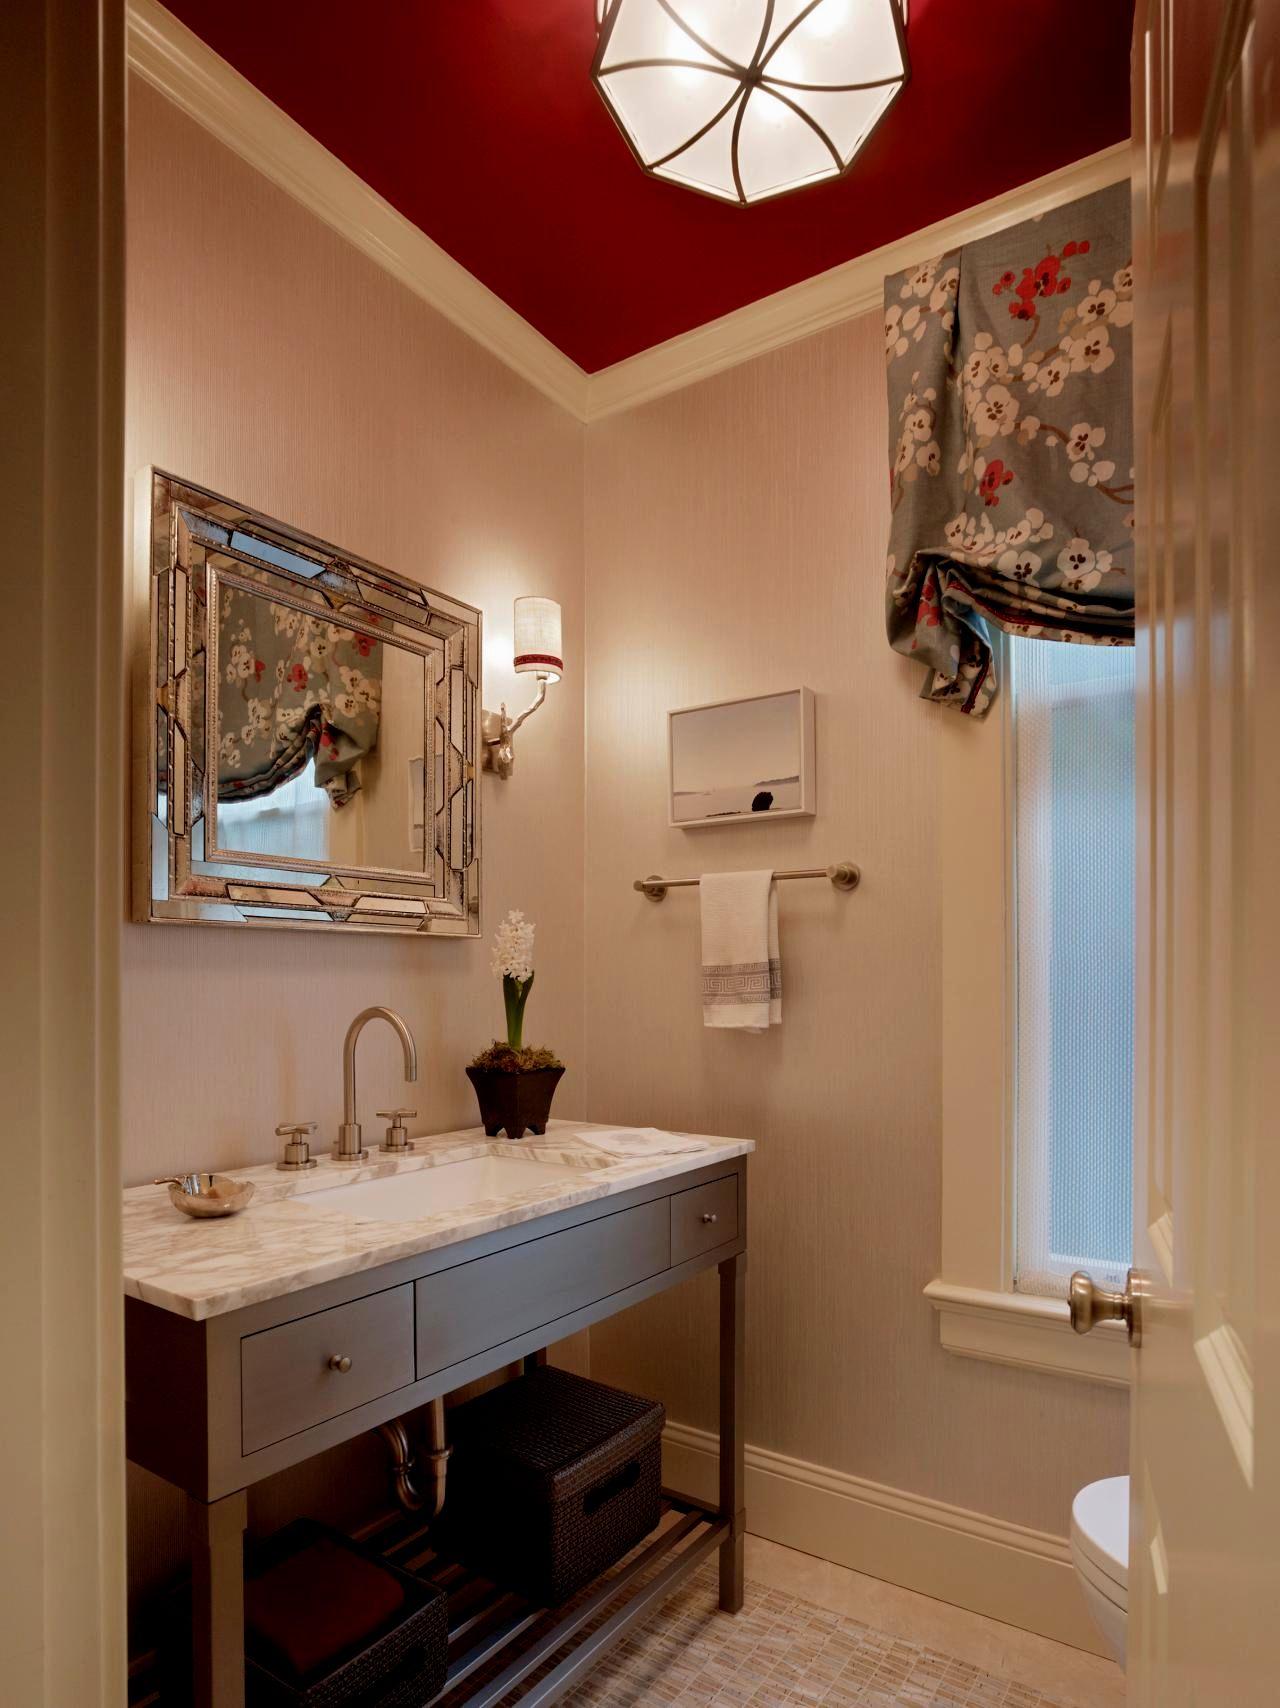 stunning bathroom design ideas gallery-Amazing Bathroom Design Ideas Model